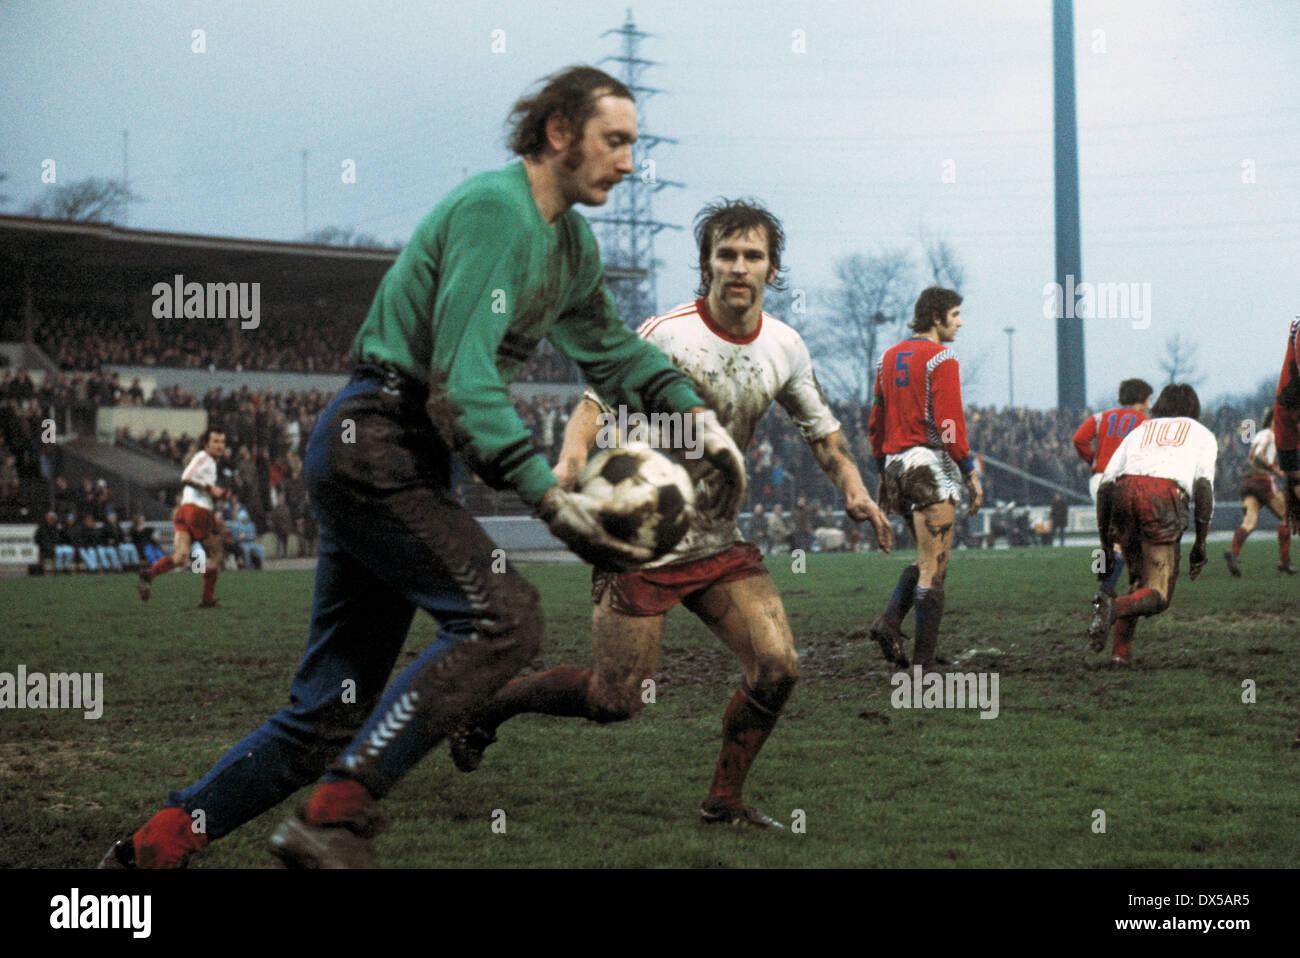 football, 2. Bundesliga Nord, 1974/1975, Niederrheinstadion, Rot Weiss Oberhausen versus FC Bayer 05 Uerdingen 1:3, scene of the match, mudbath, goal kick of keeper Manfred Kroke (Bayer), behind Walter Krause (RWO) - Stock Image